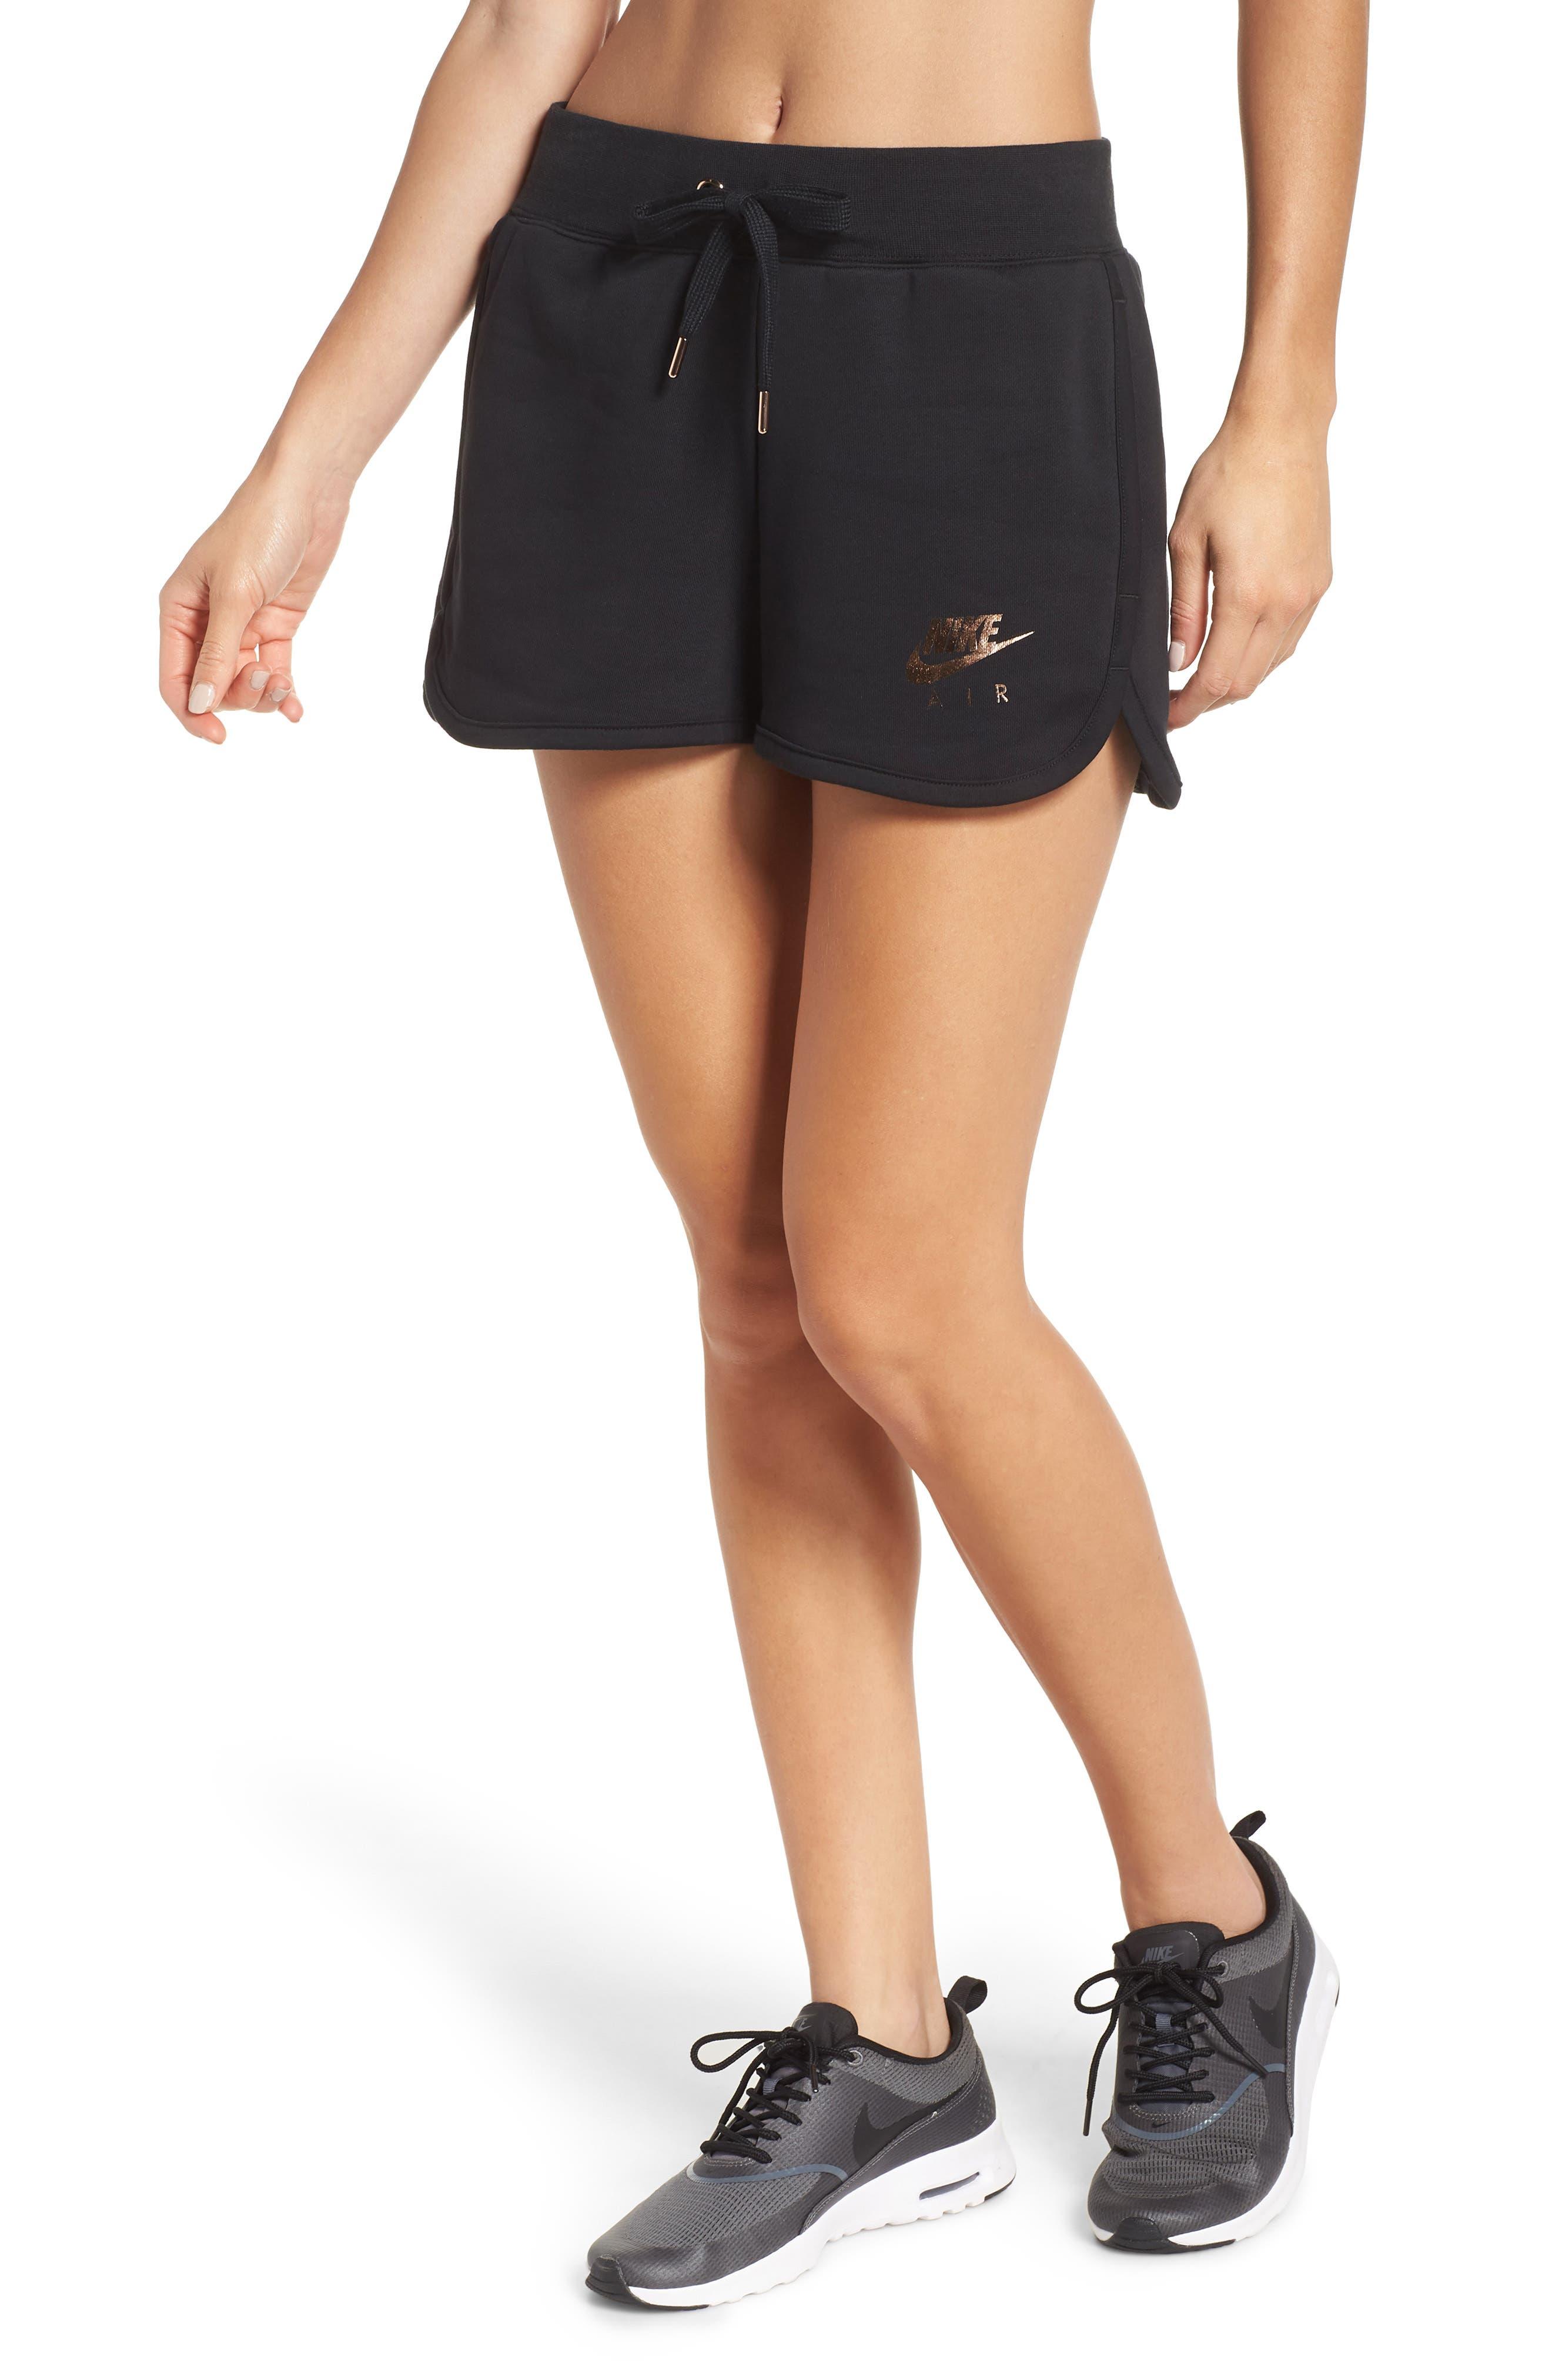 Sportswear Air Shorts,                             Main thumbnail 1, color,                             010